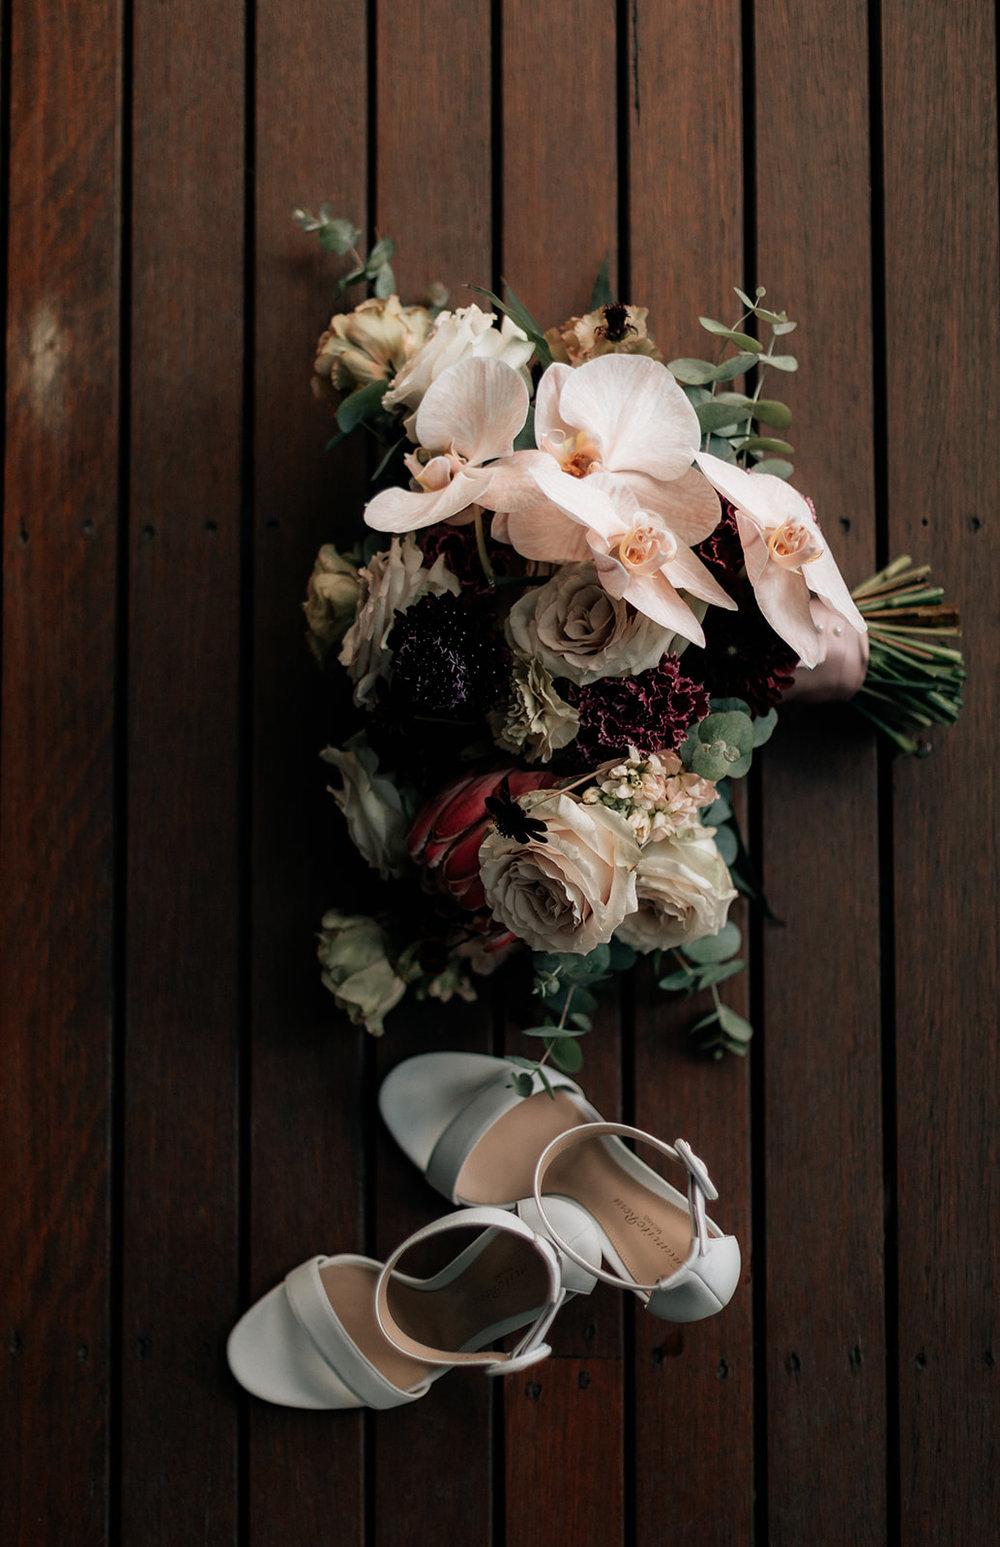 Karis and Oli_Sydney Wedding_Bradleys Head_Holly Medway Photography-33.jpg